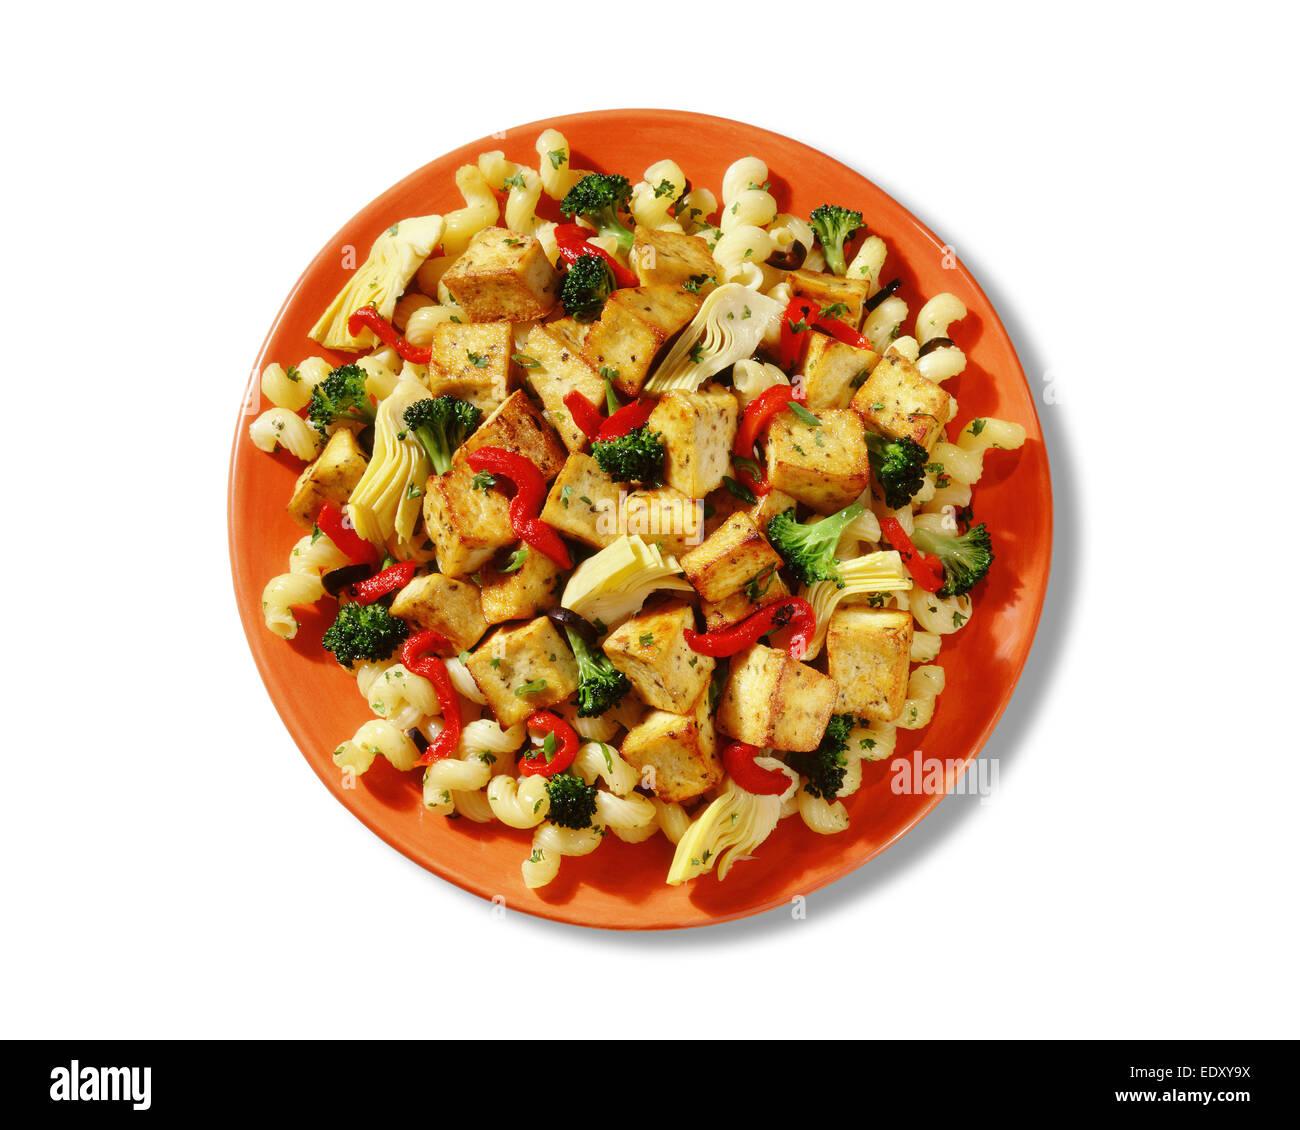 Tofu and Veggie Pasta - Stock Image